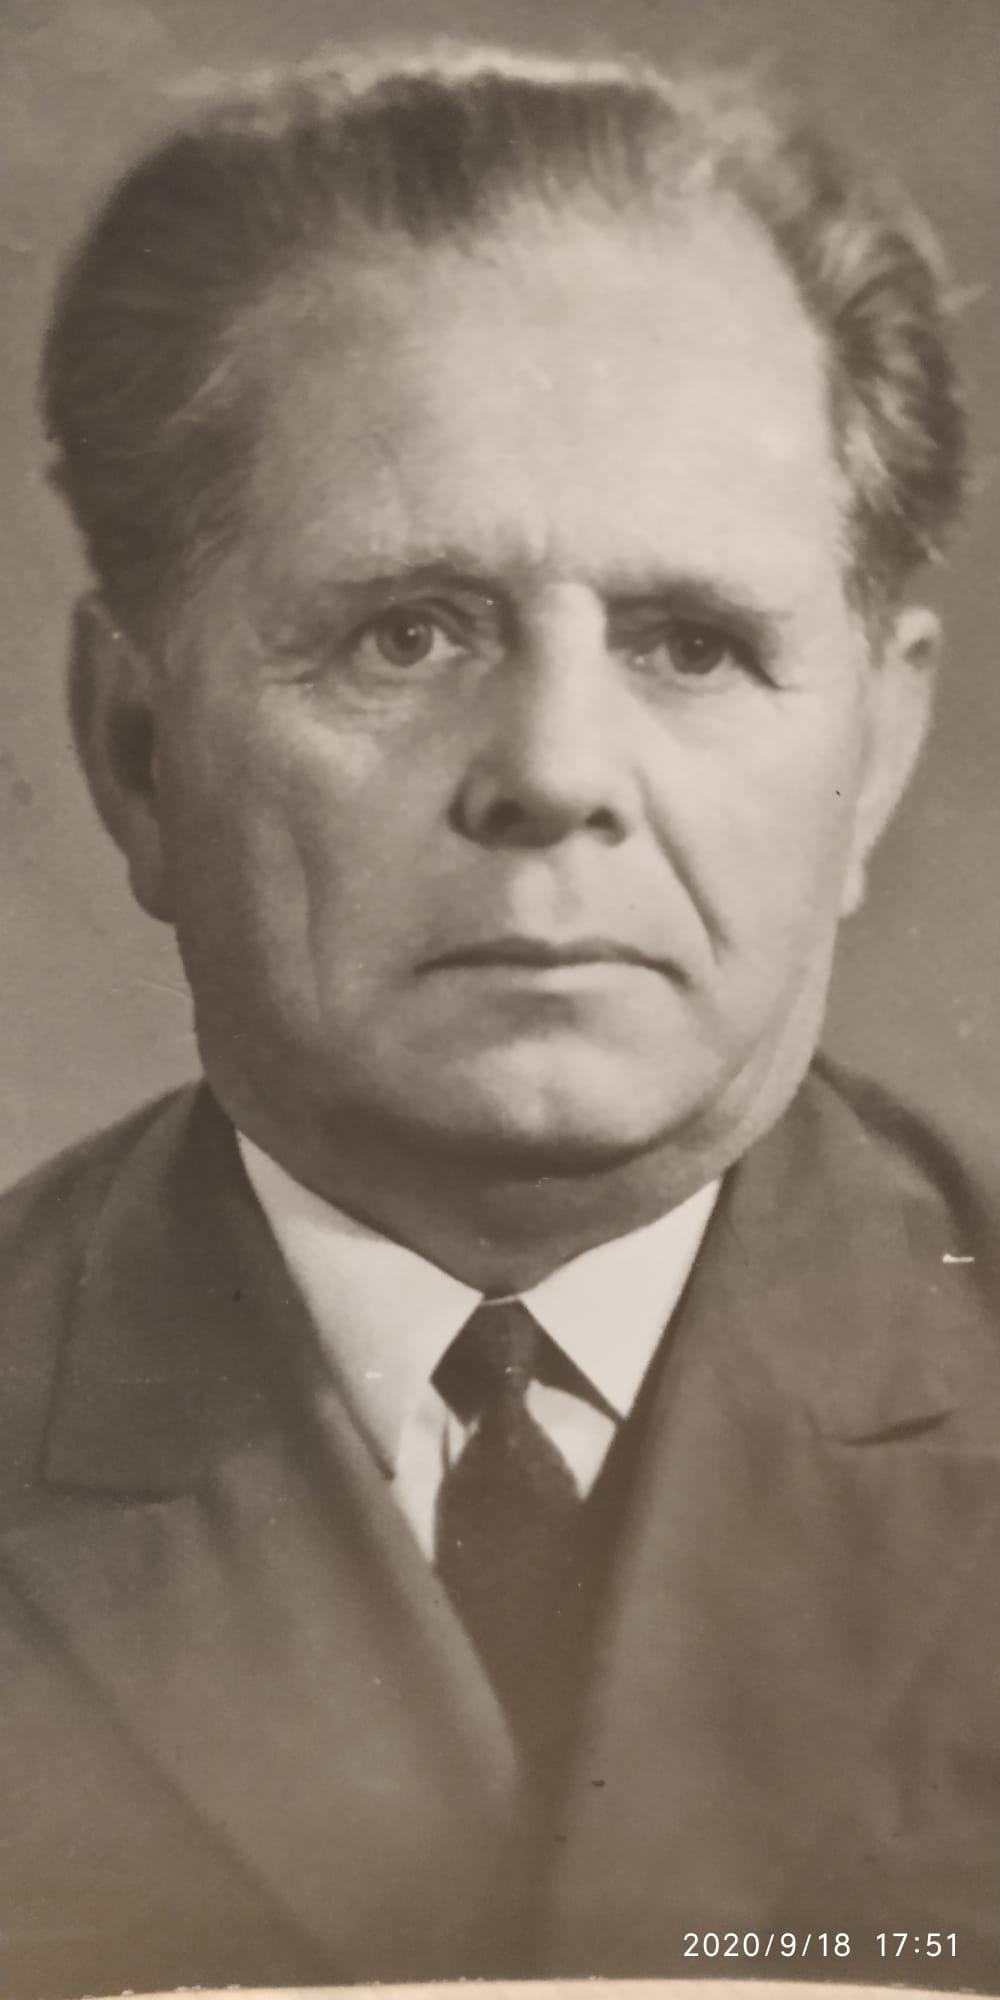 Кравченко, Антон Васильевич. Director de la casa de Jerson